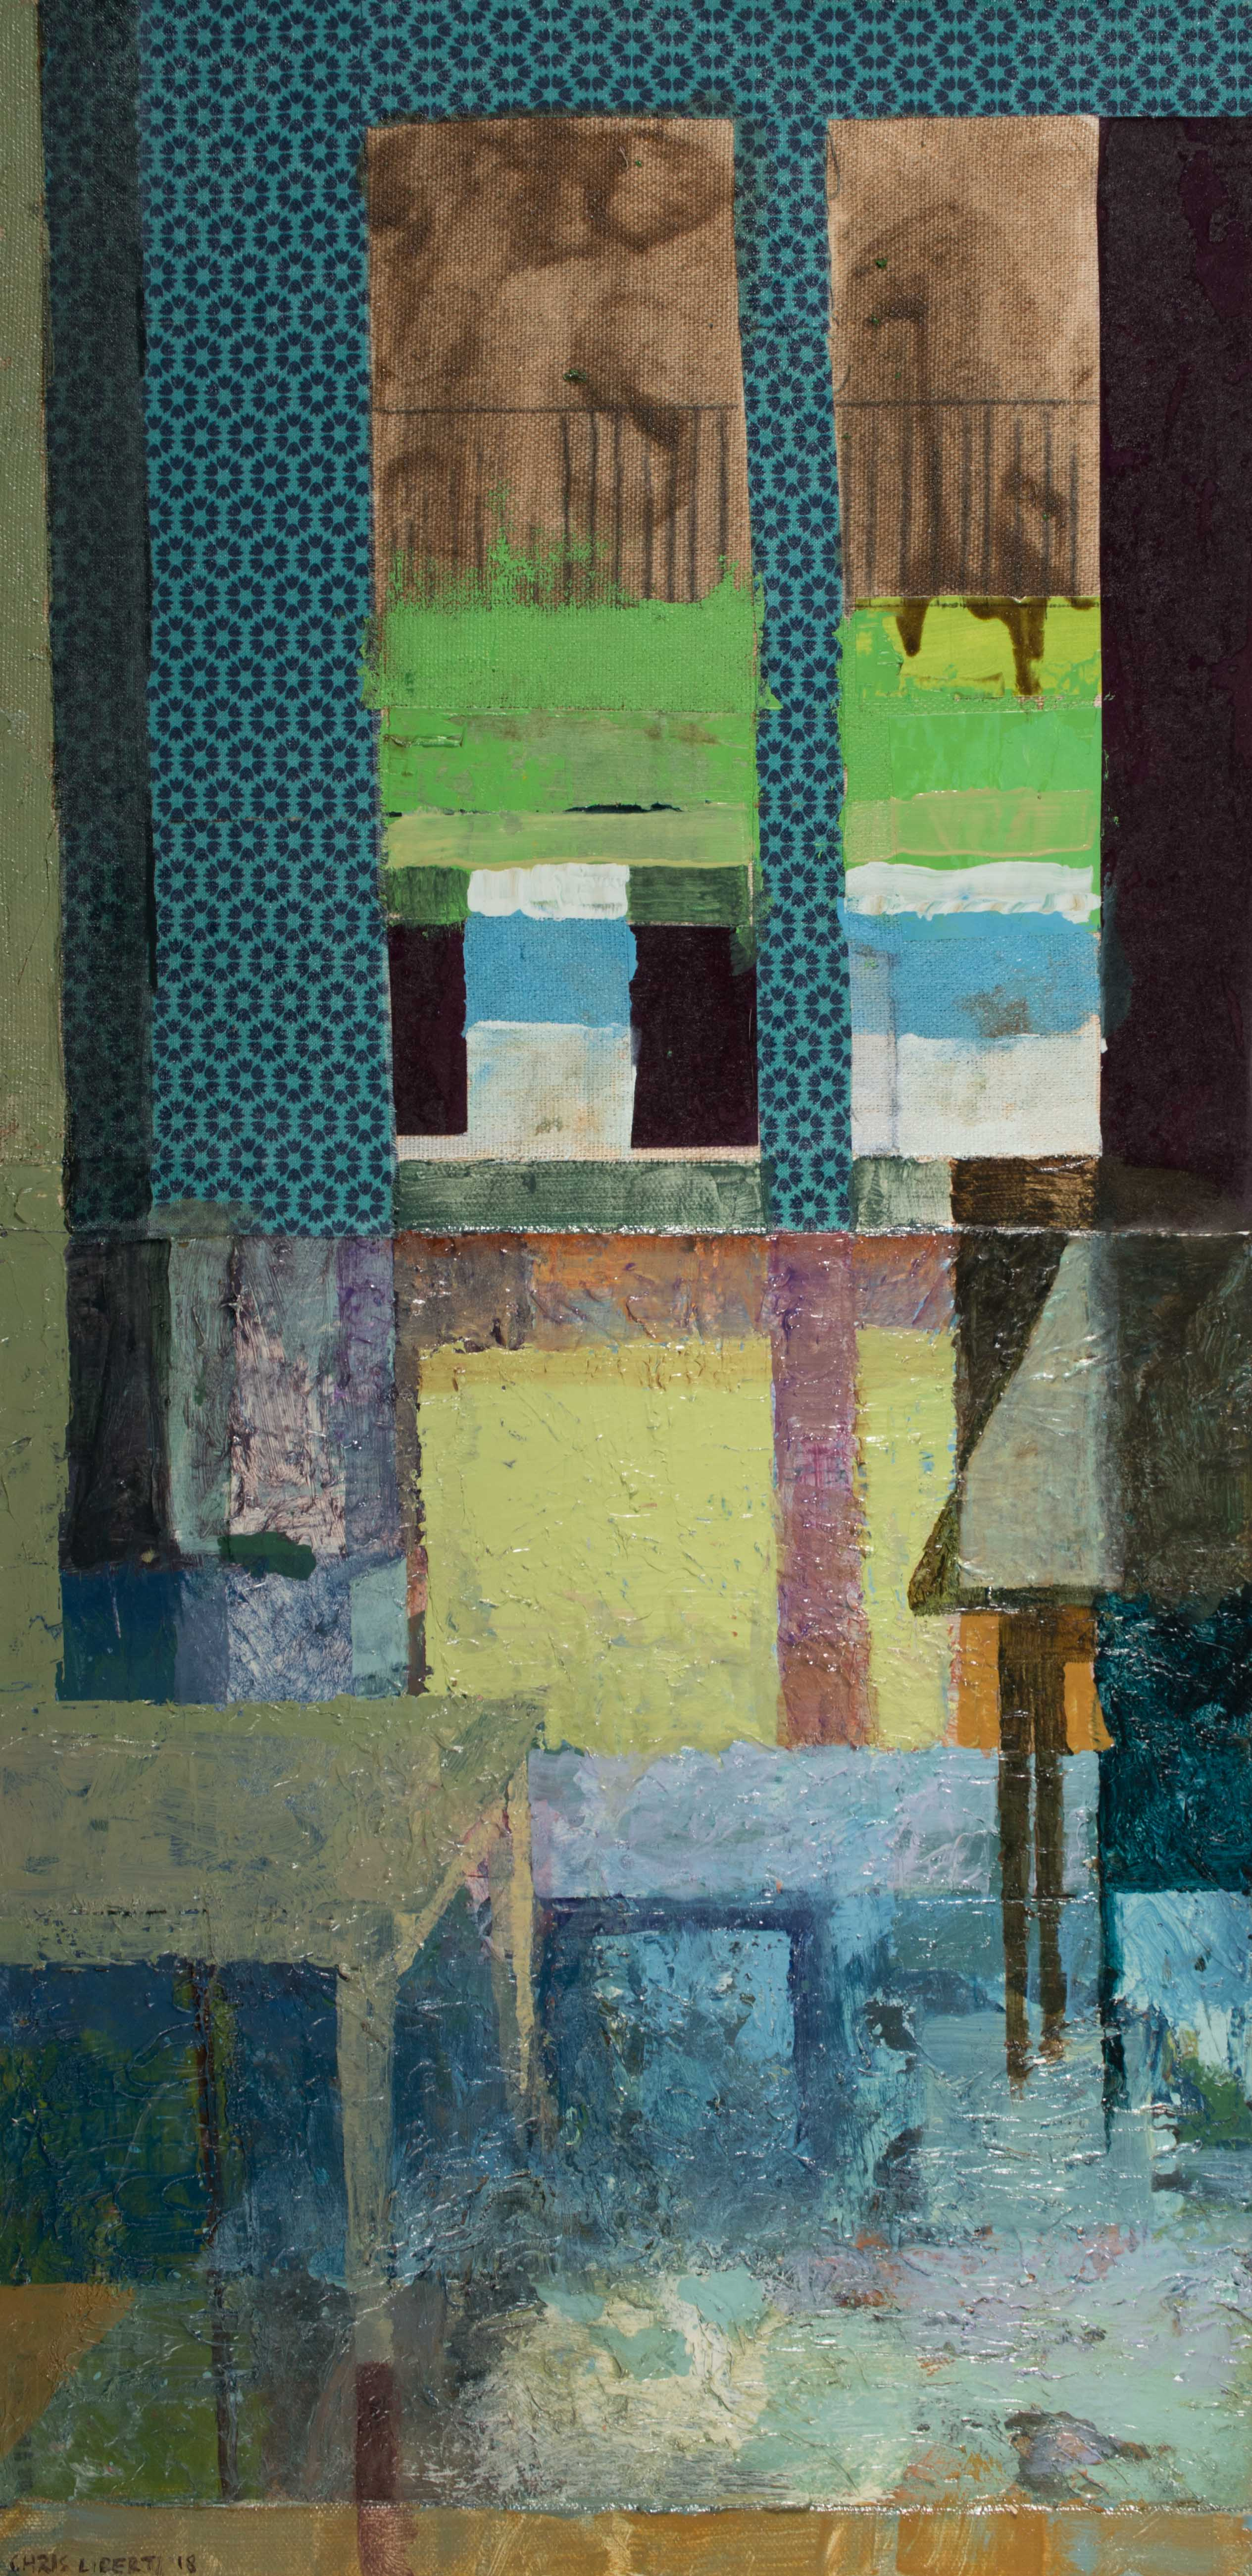 Chris Liberti - 2 Interiors